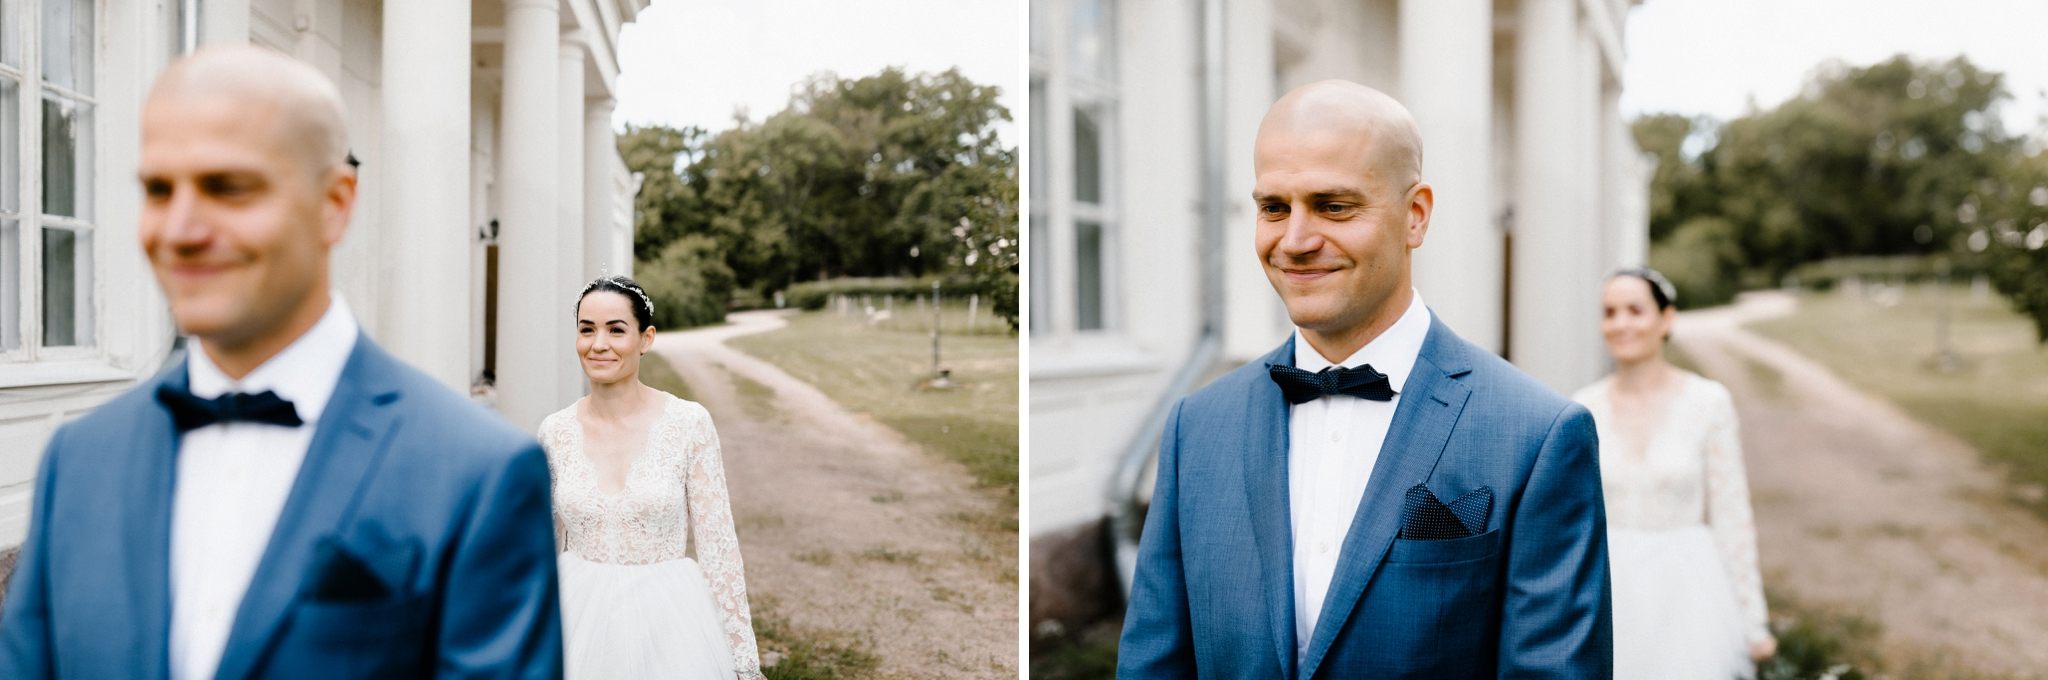 Essi + Ville   Oitbacka Gården   by Patrick Karkkolainen Wedding Photography-42.jpg